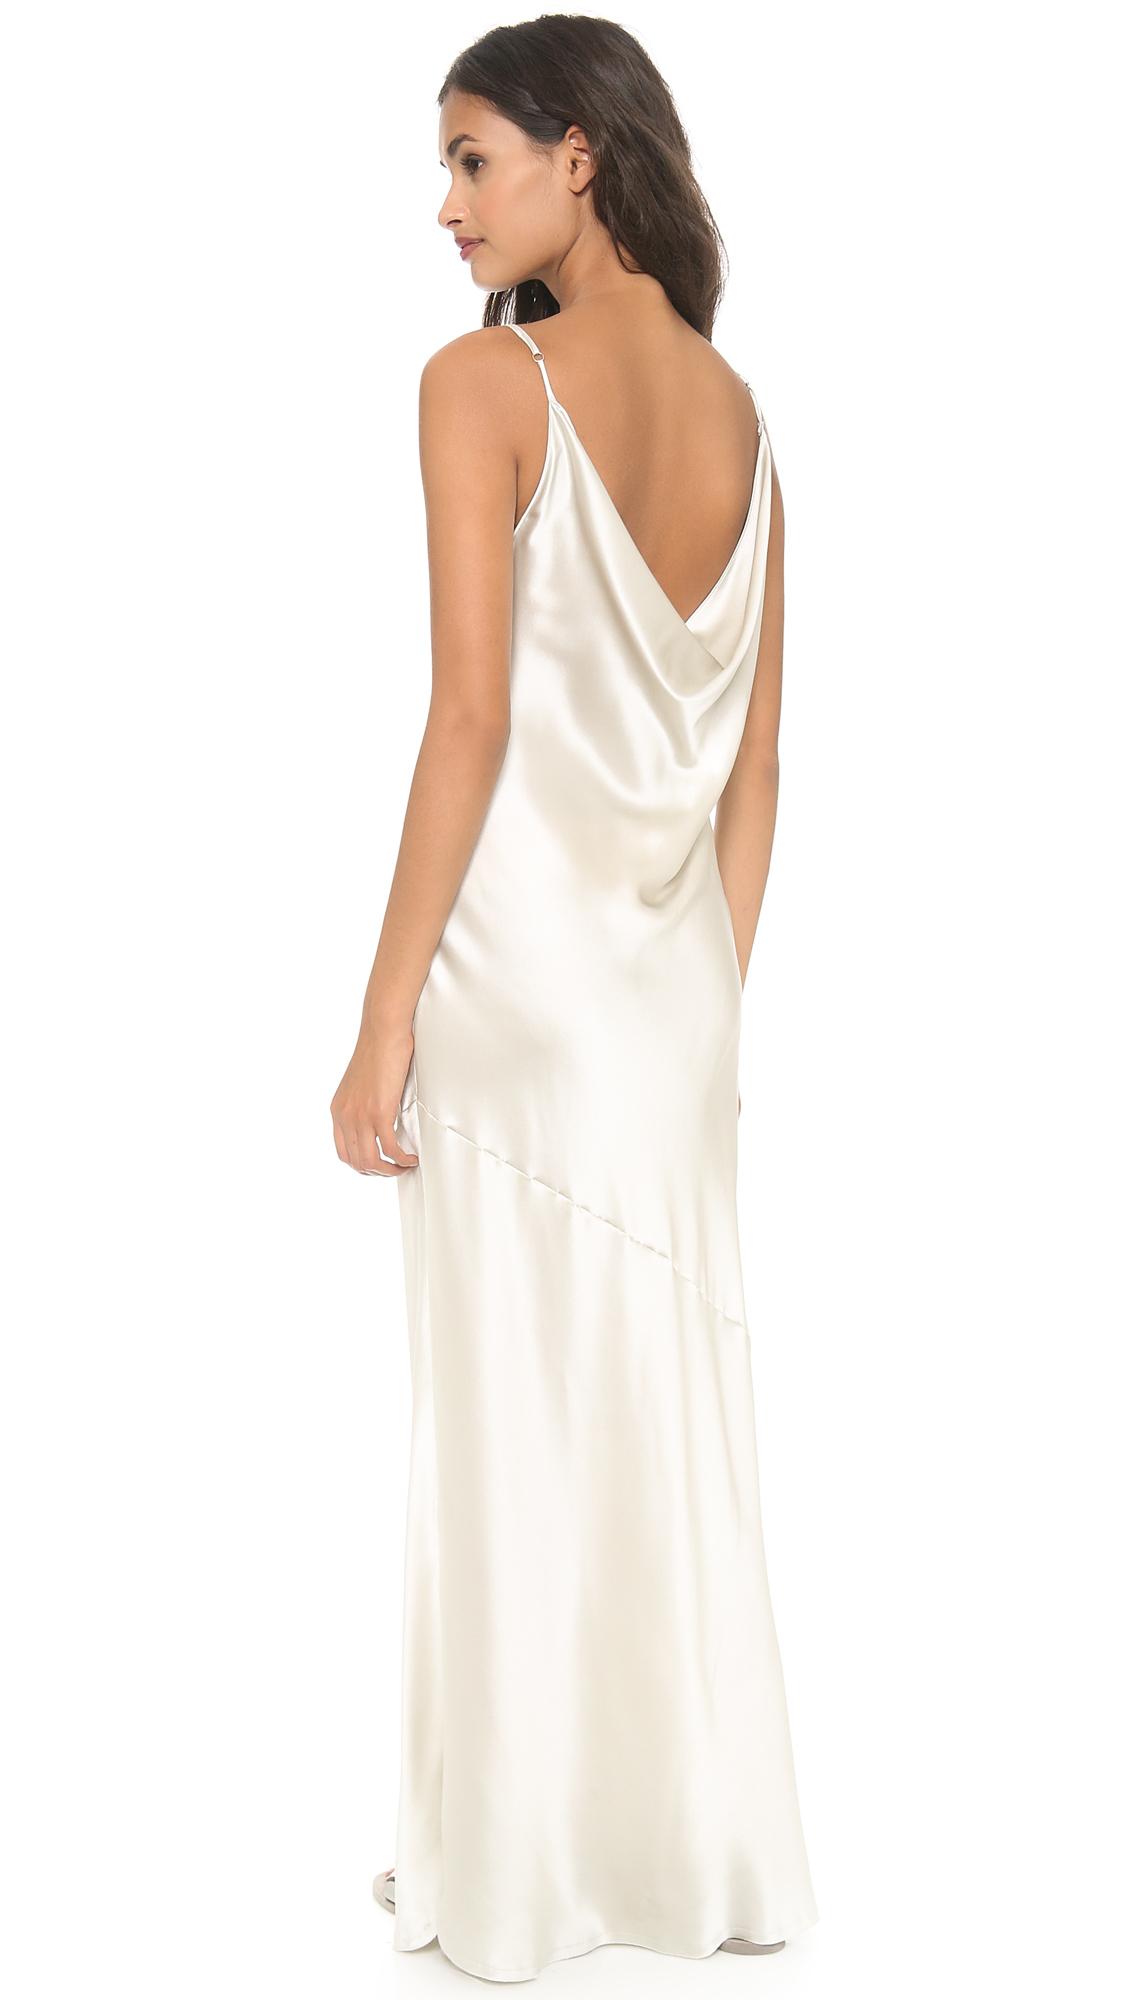 Nili lotan low back maxi dress ivory dew in white lyst for White silk slip wedding dress